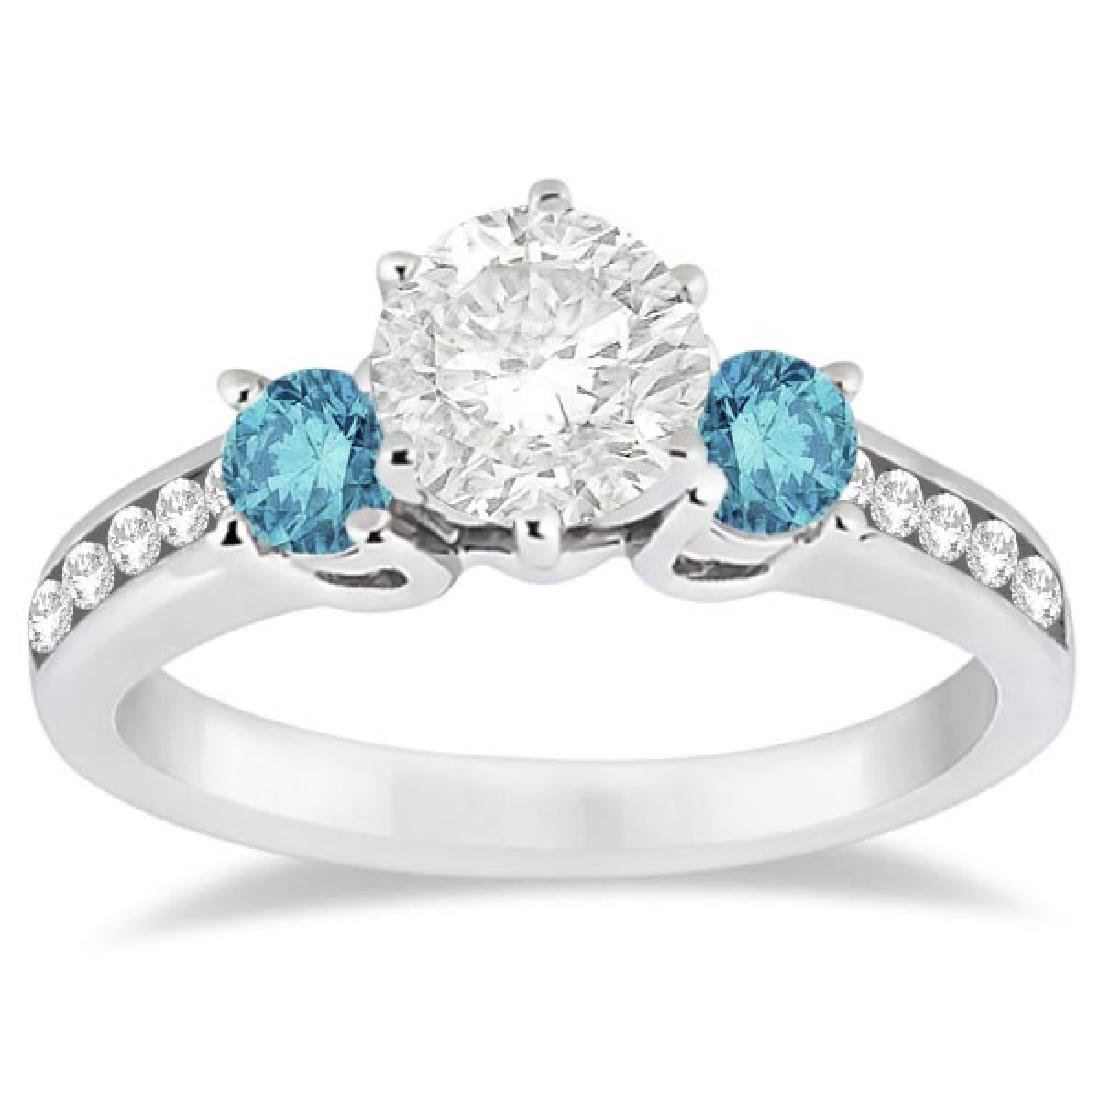 3 Stone White and Blue Diamond Engagement Ring 18K Whit